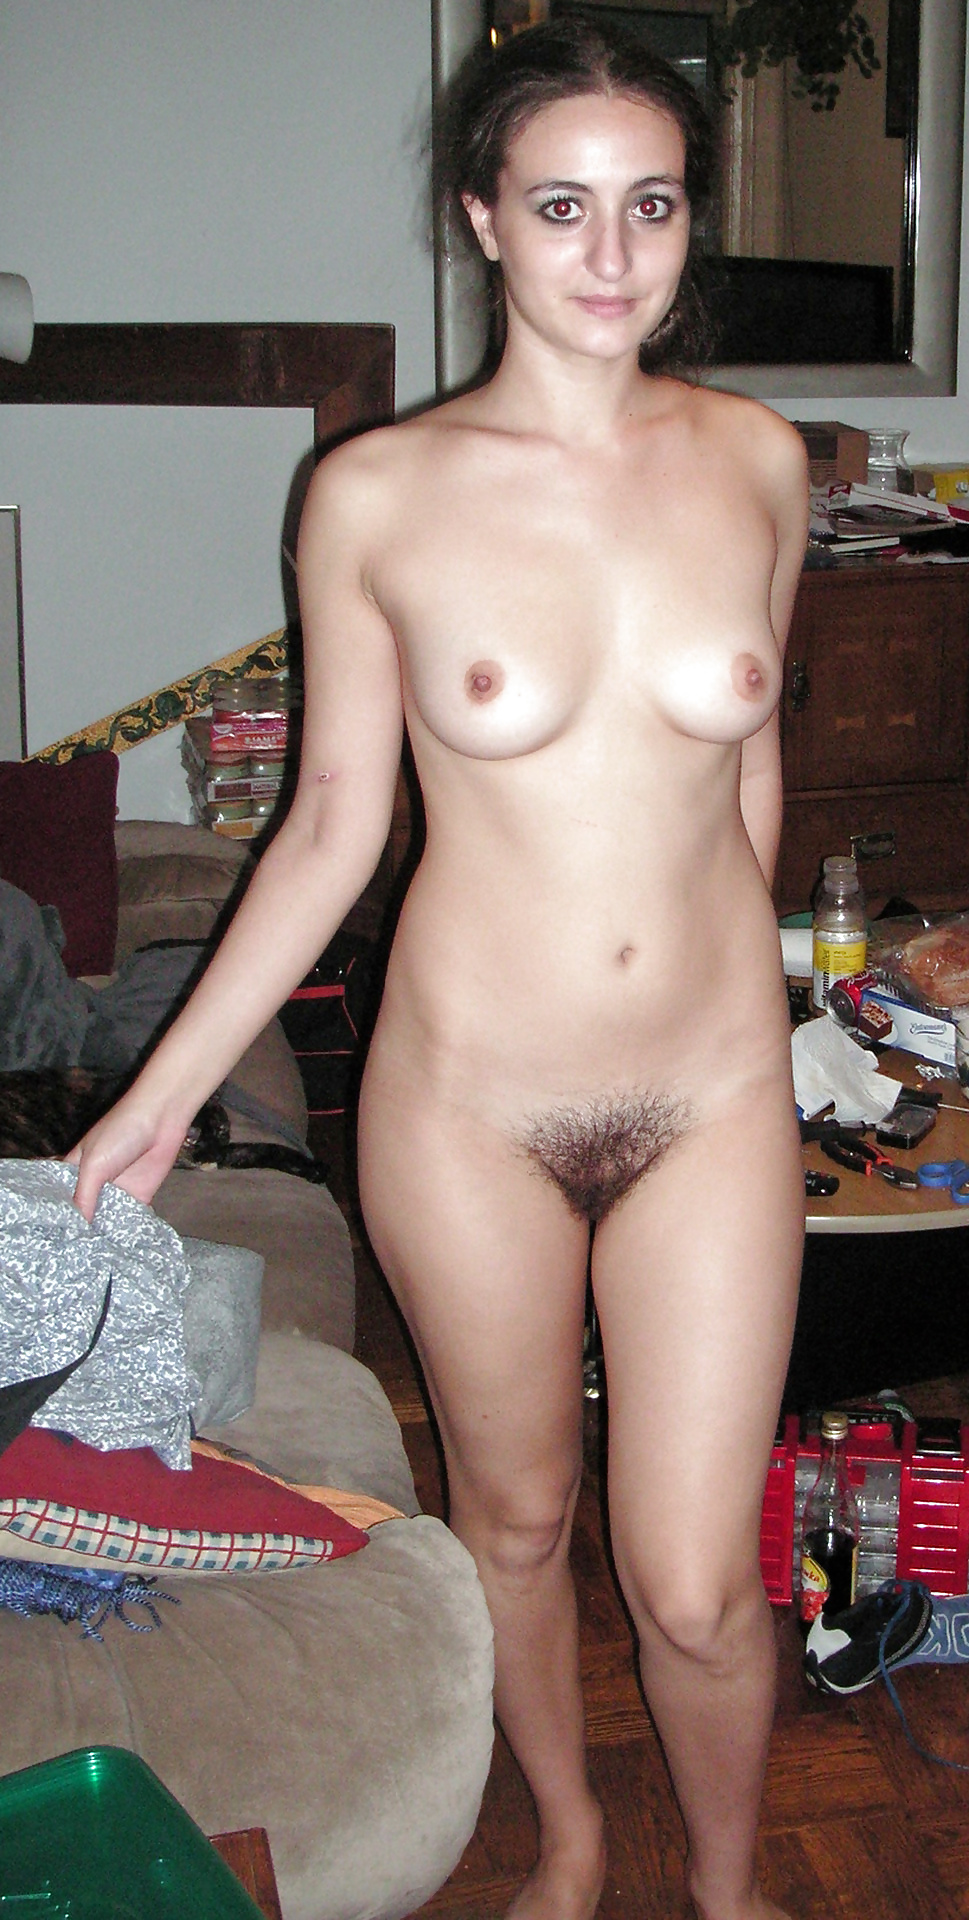 real-amatrices-full-naked-ballet-dancer-penis